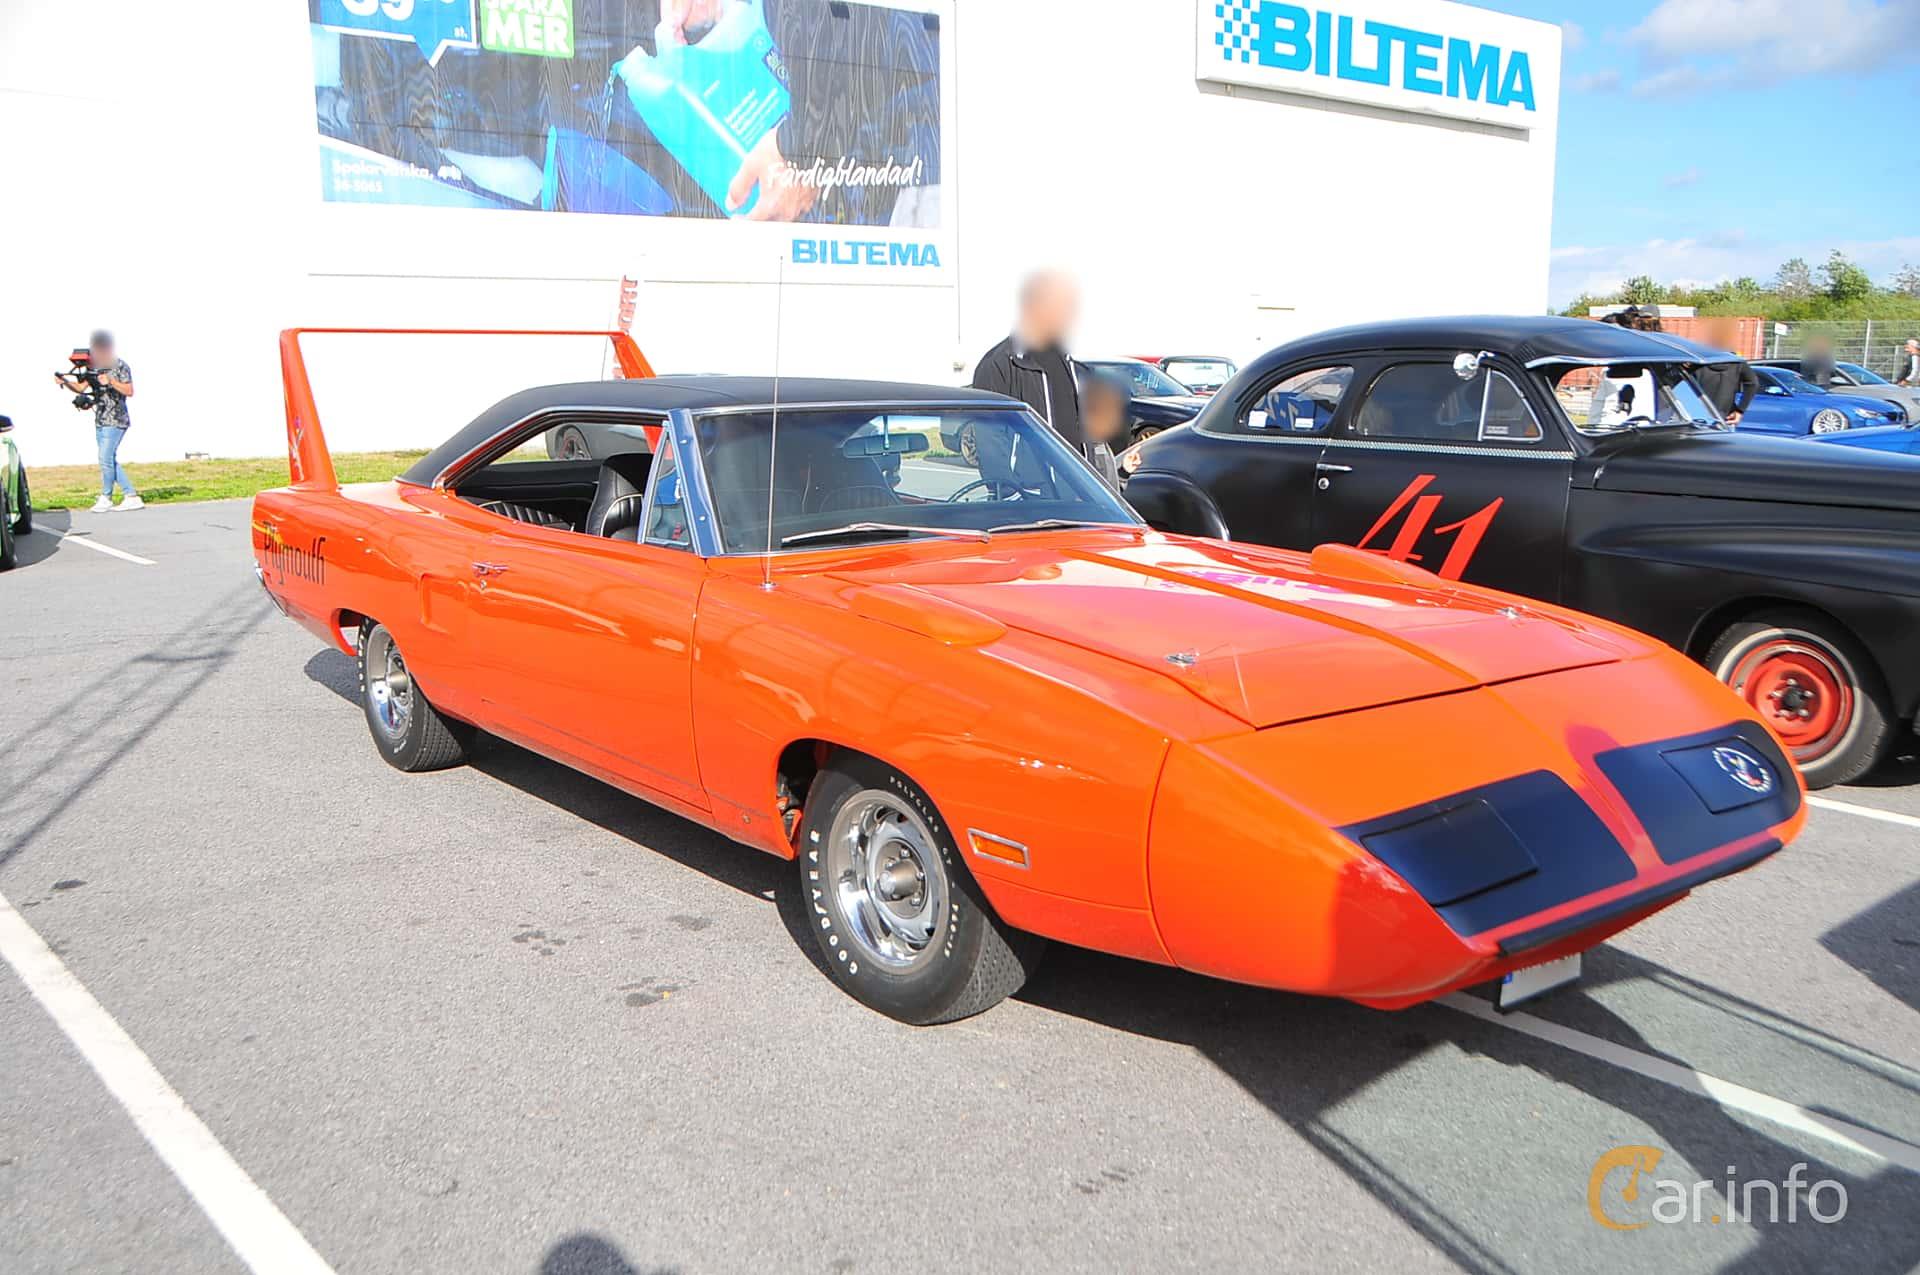 Plymouth Road Runner Superbird 7.2 V8 TorqueFlite, 375hp, 1970 at Biltema Gatbilar Lund 2018